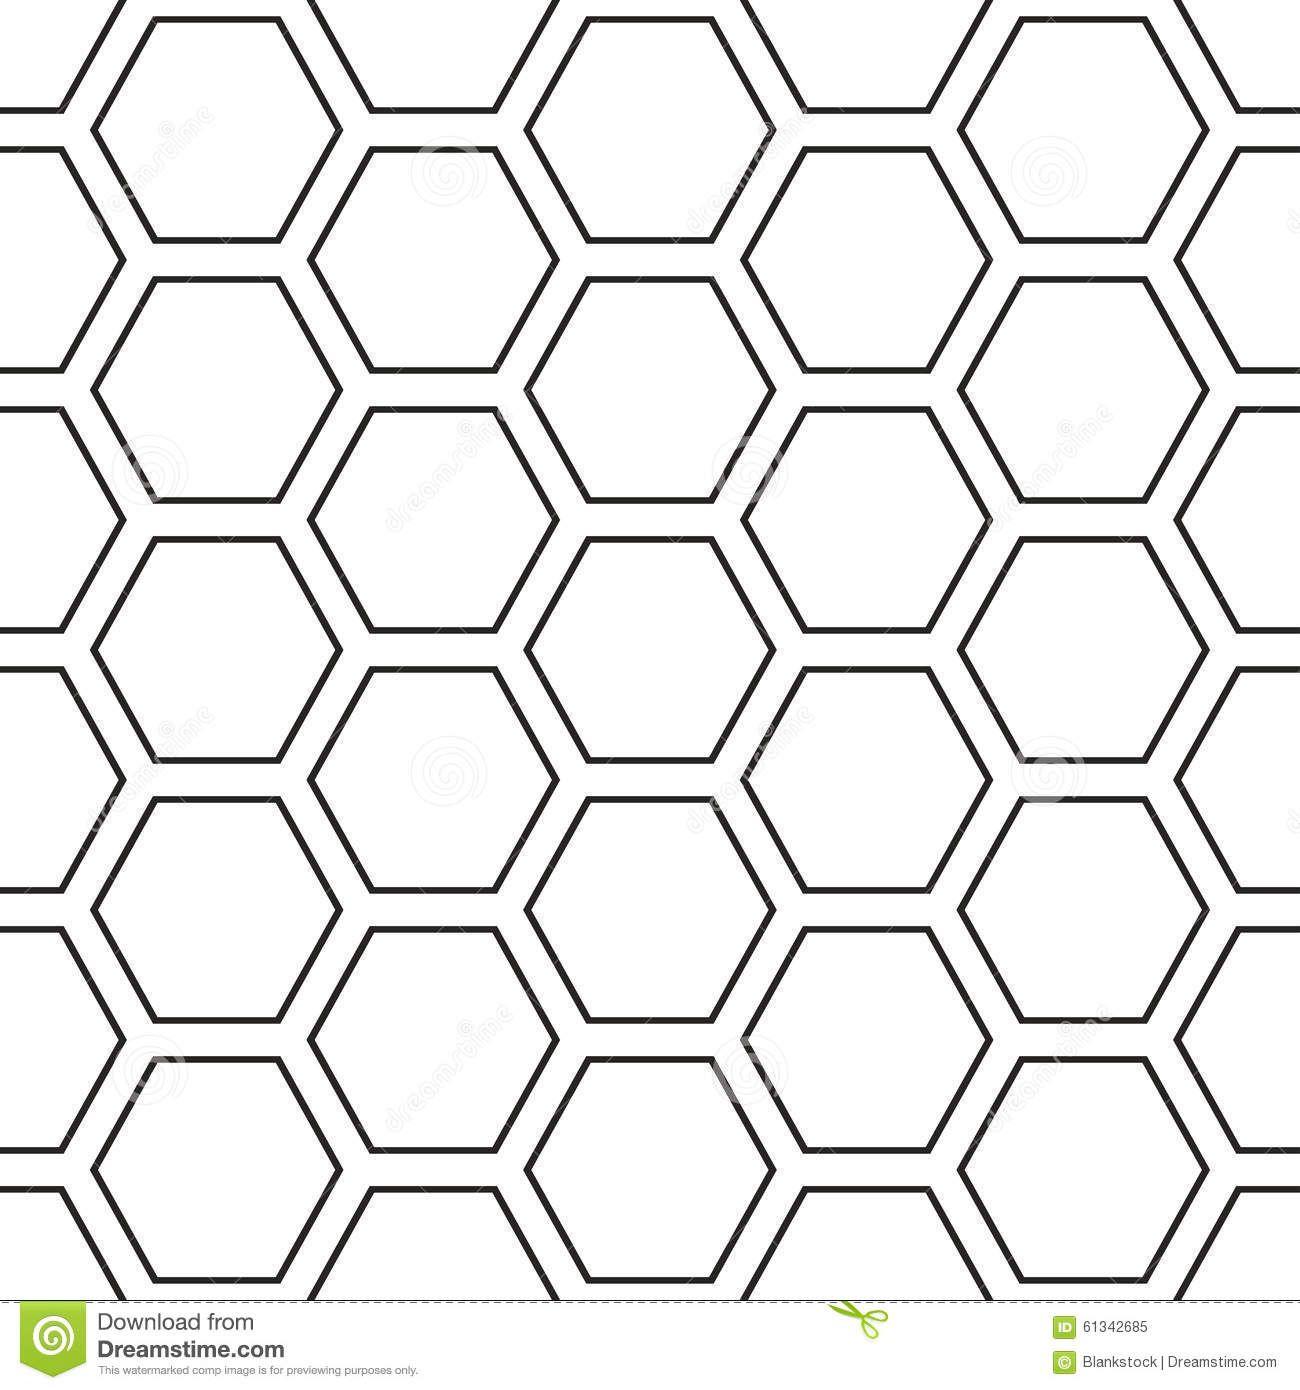 Imagen Relacionada Hexagon